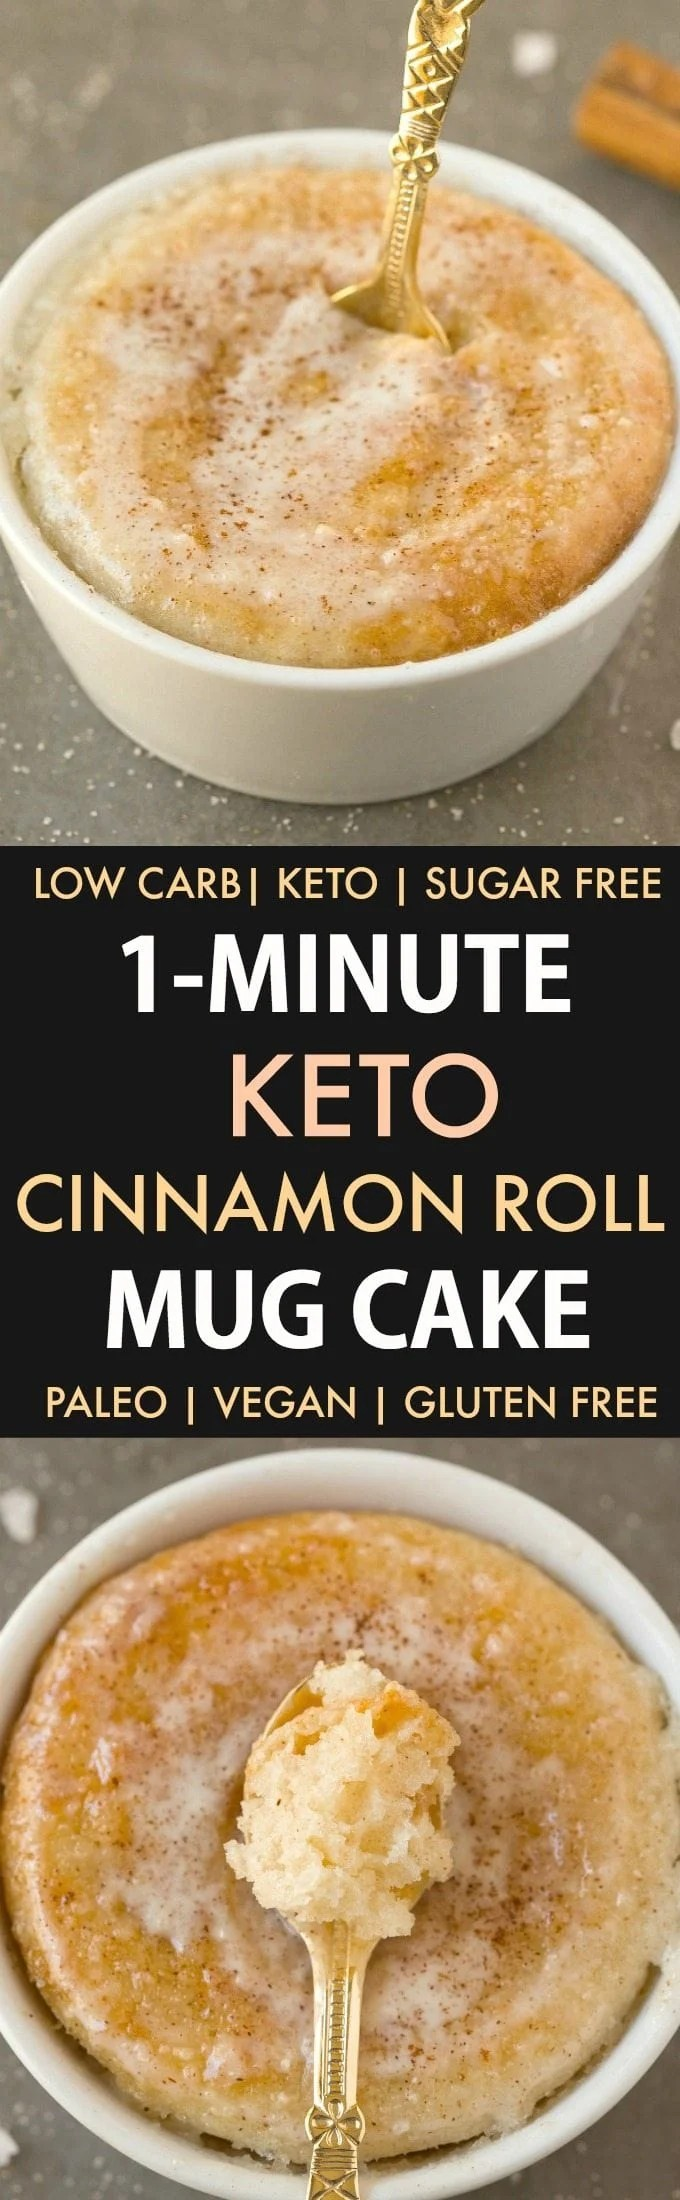 Vegan Cinnamon Roll Mug Cake